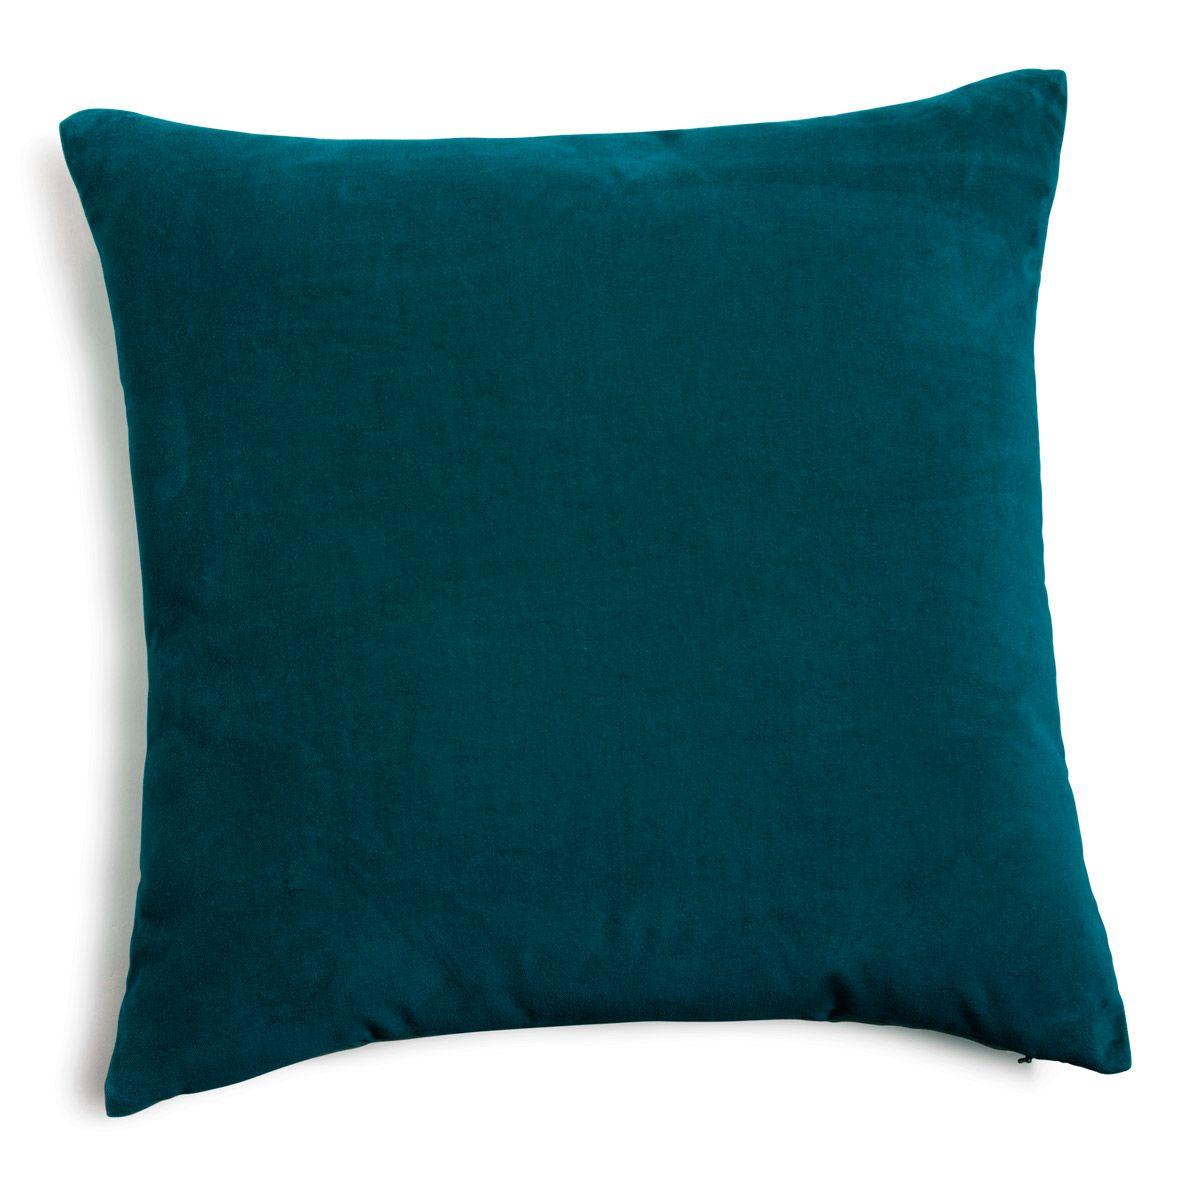 coussin en velours bleu canard 45x45 wishlist 2018 velvet cushions teal cushions et blue. Black Bedroom Furniture Sets. Home Design Ideas